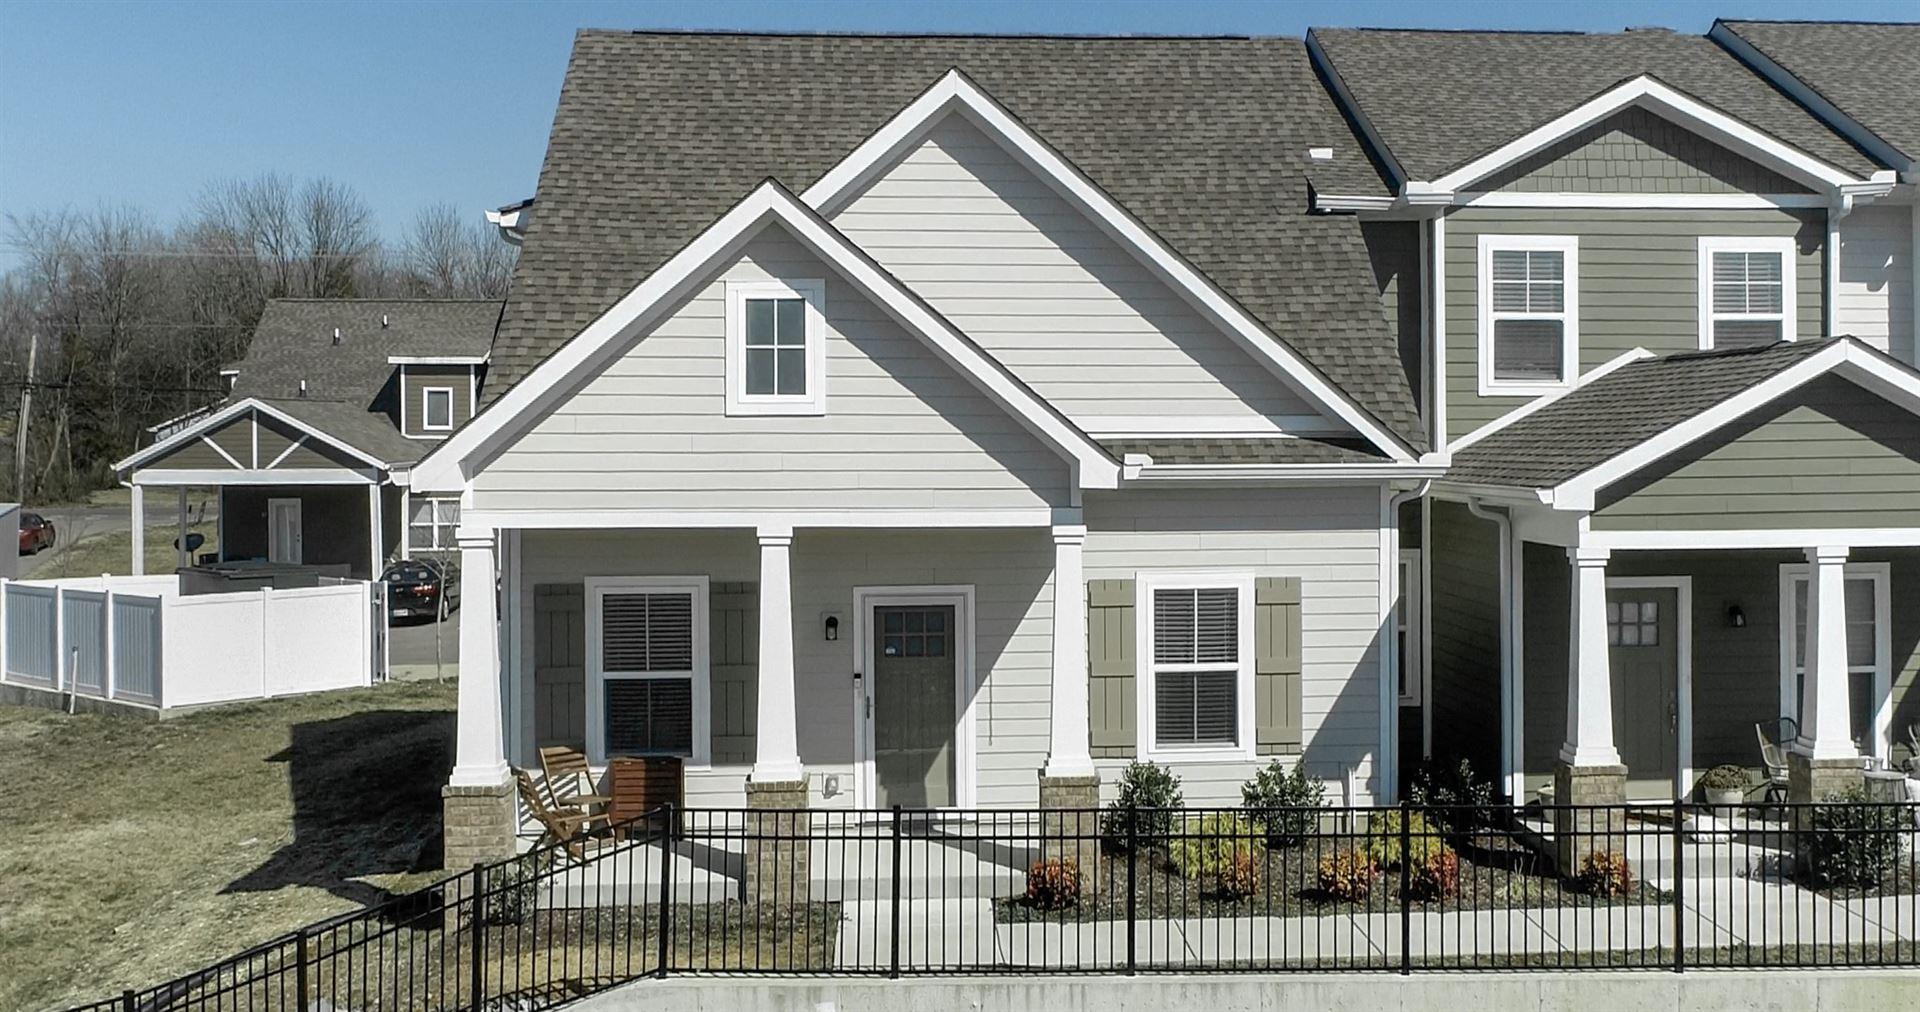 838 Ashland Place Dr, Nashville, TN 37218 - MLS#: 2231720